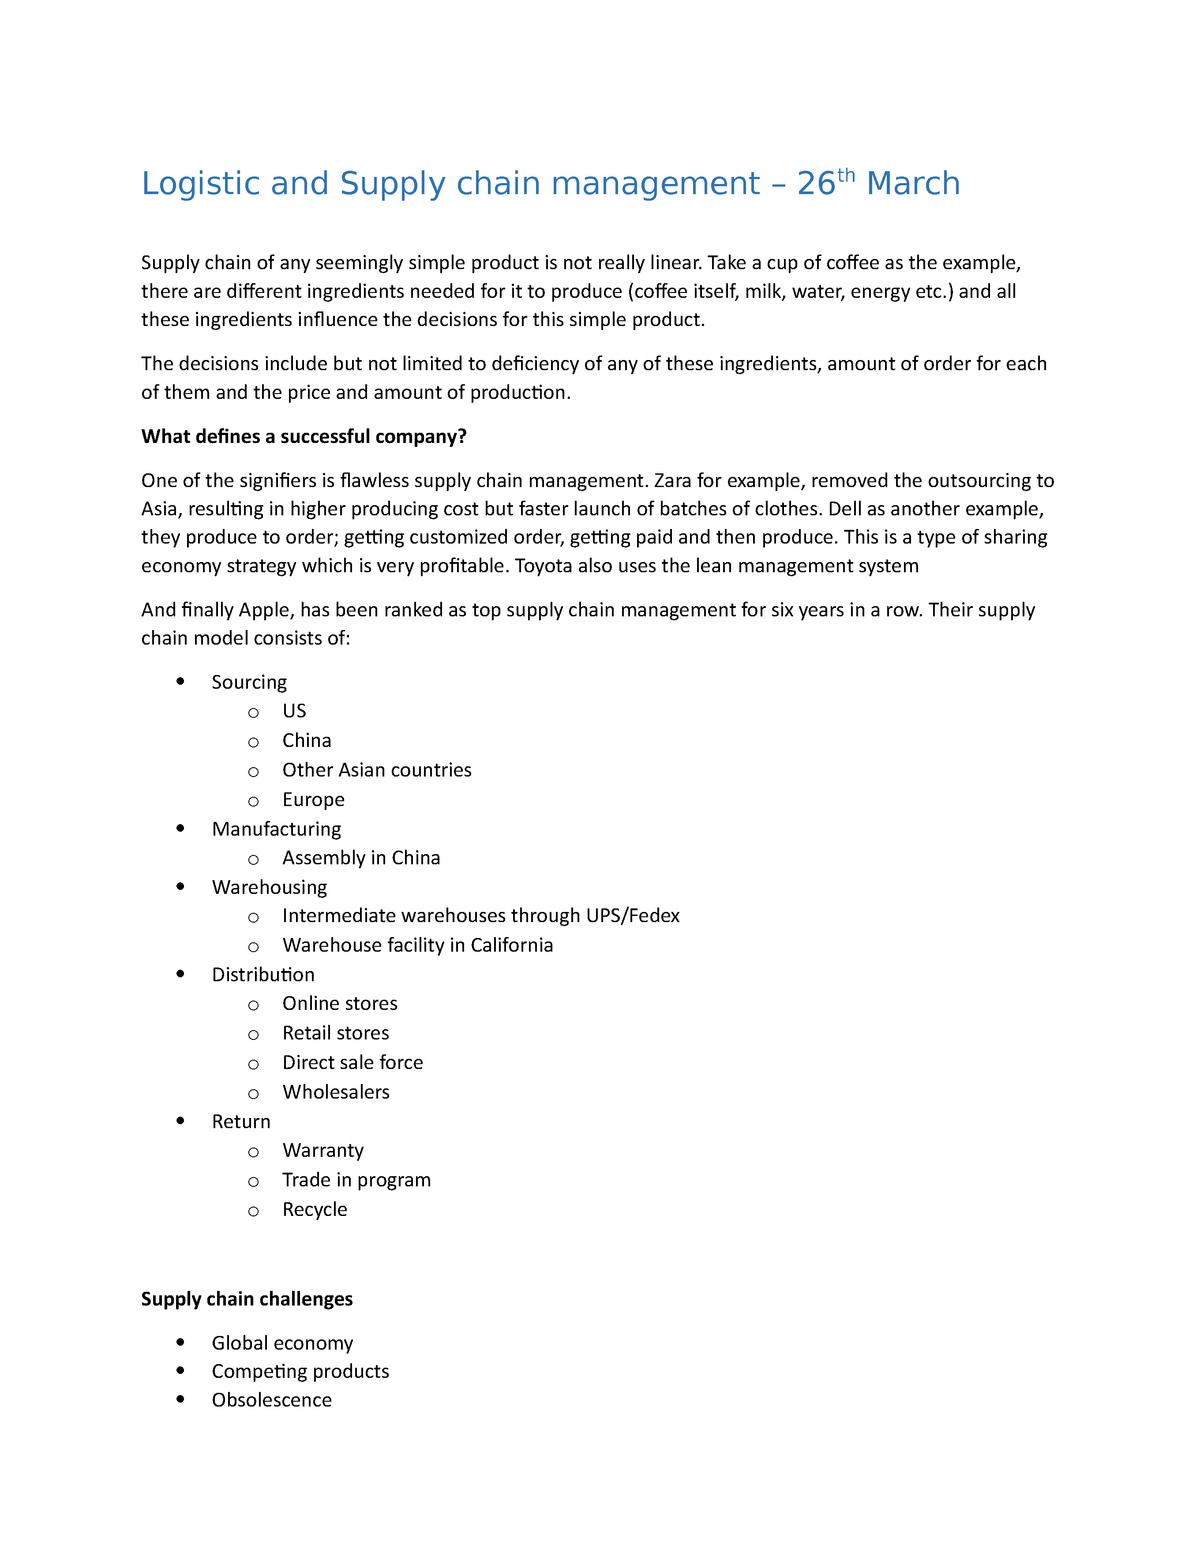 01-Logistic and Supply chain management - TEK285: Logistics